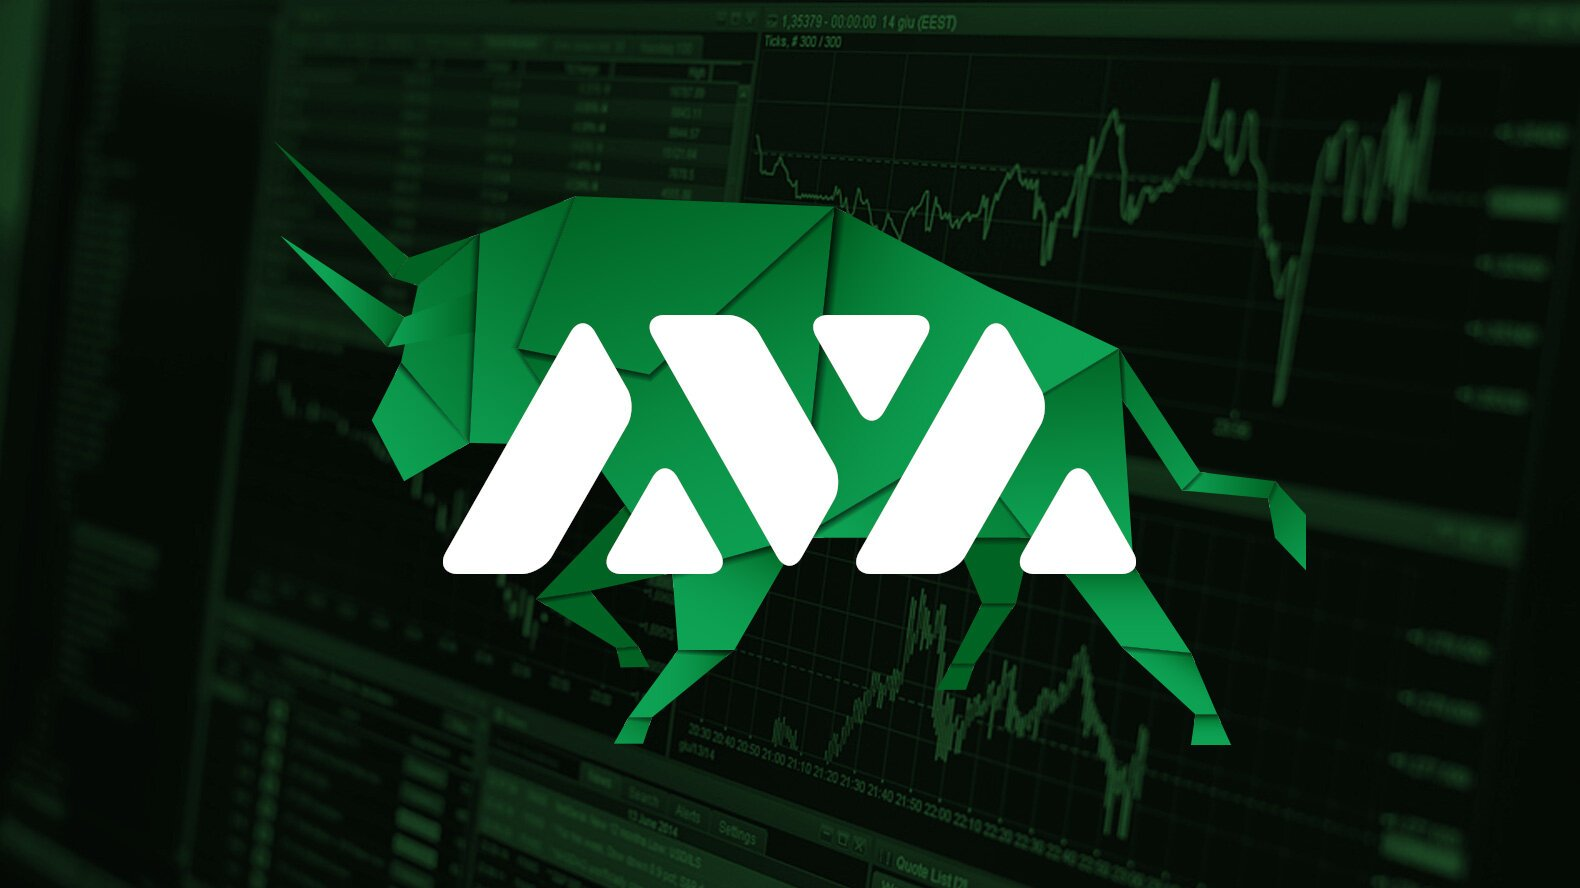 avalanche price analysis bullish - تحلیل تکنیکال اولانچ (AVAX)؛ سه شنبه 27 مهر